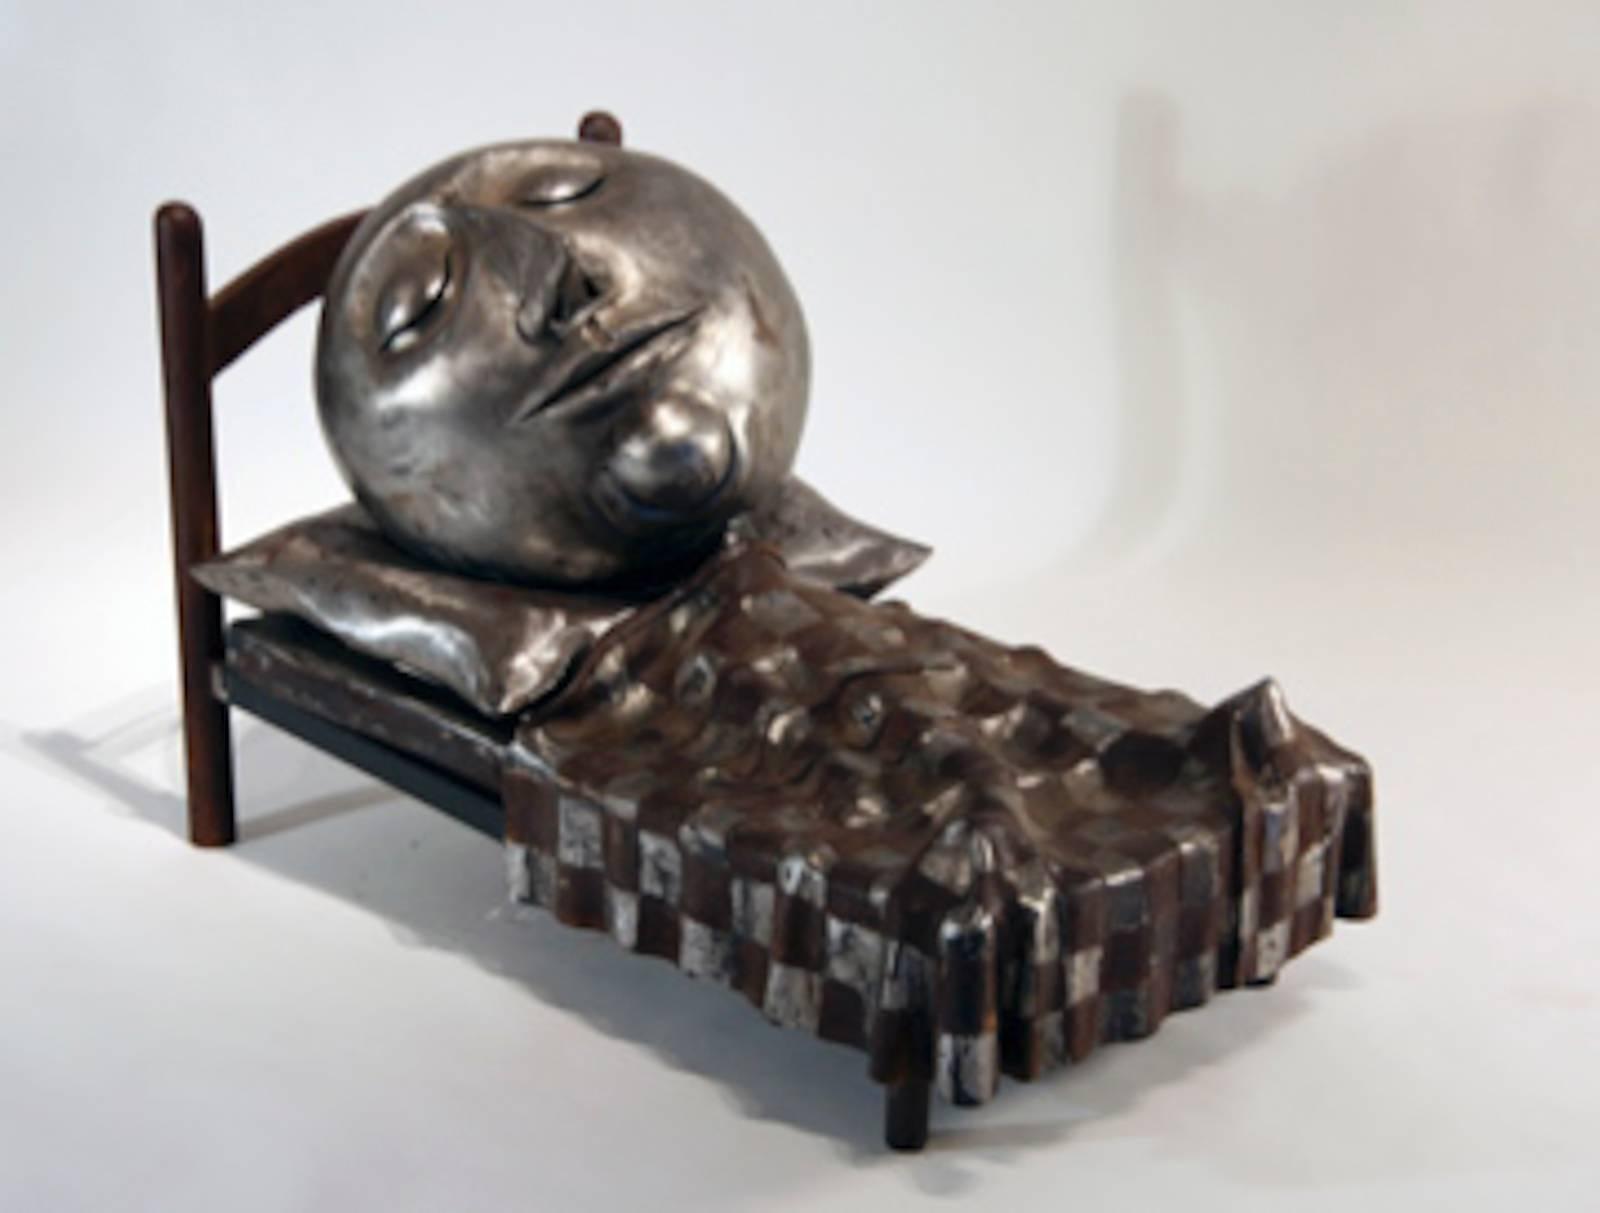 Slumber by Rodger Jacobsen fabricated steel sculpture sleeping man in bed humor